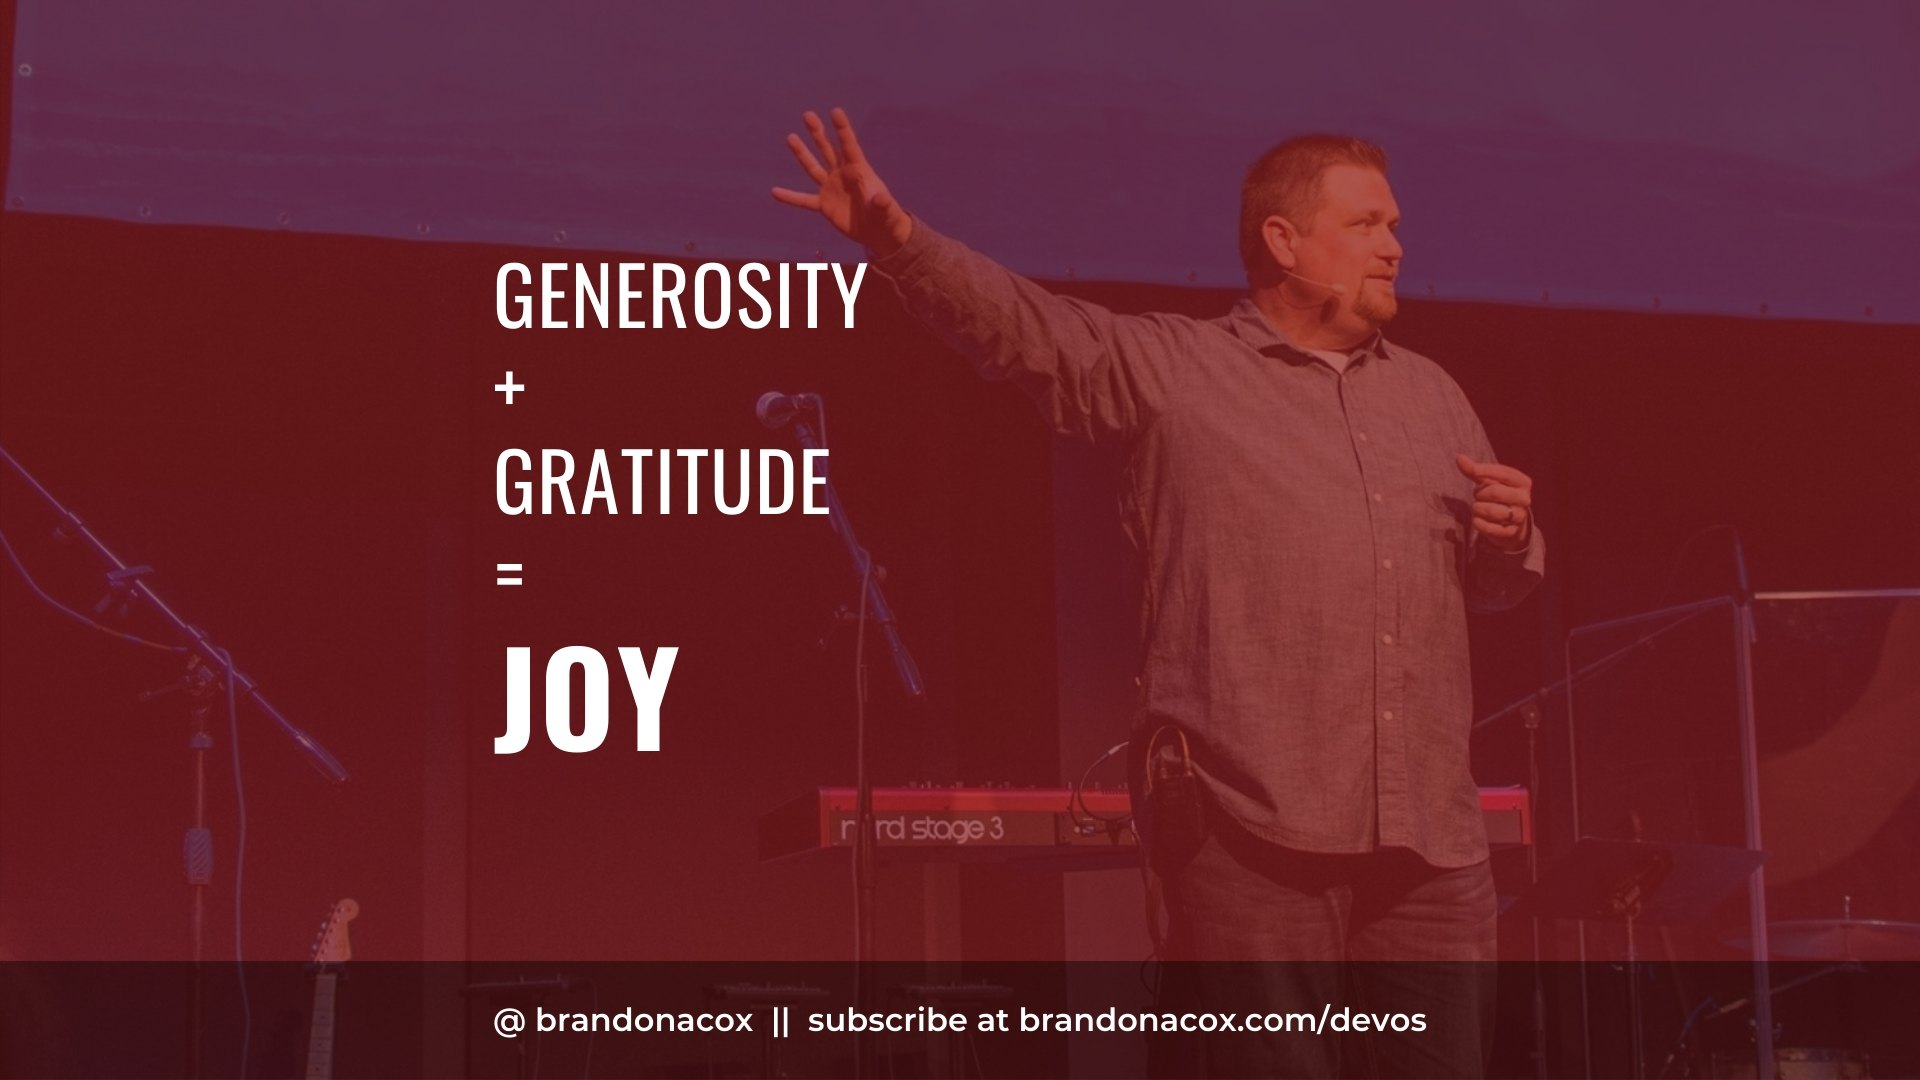 Generosity Gratitude Joy